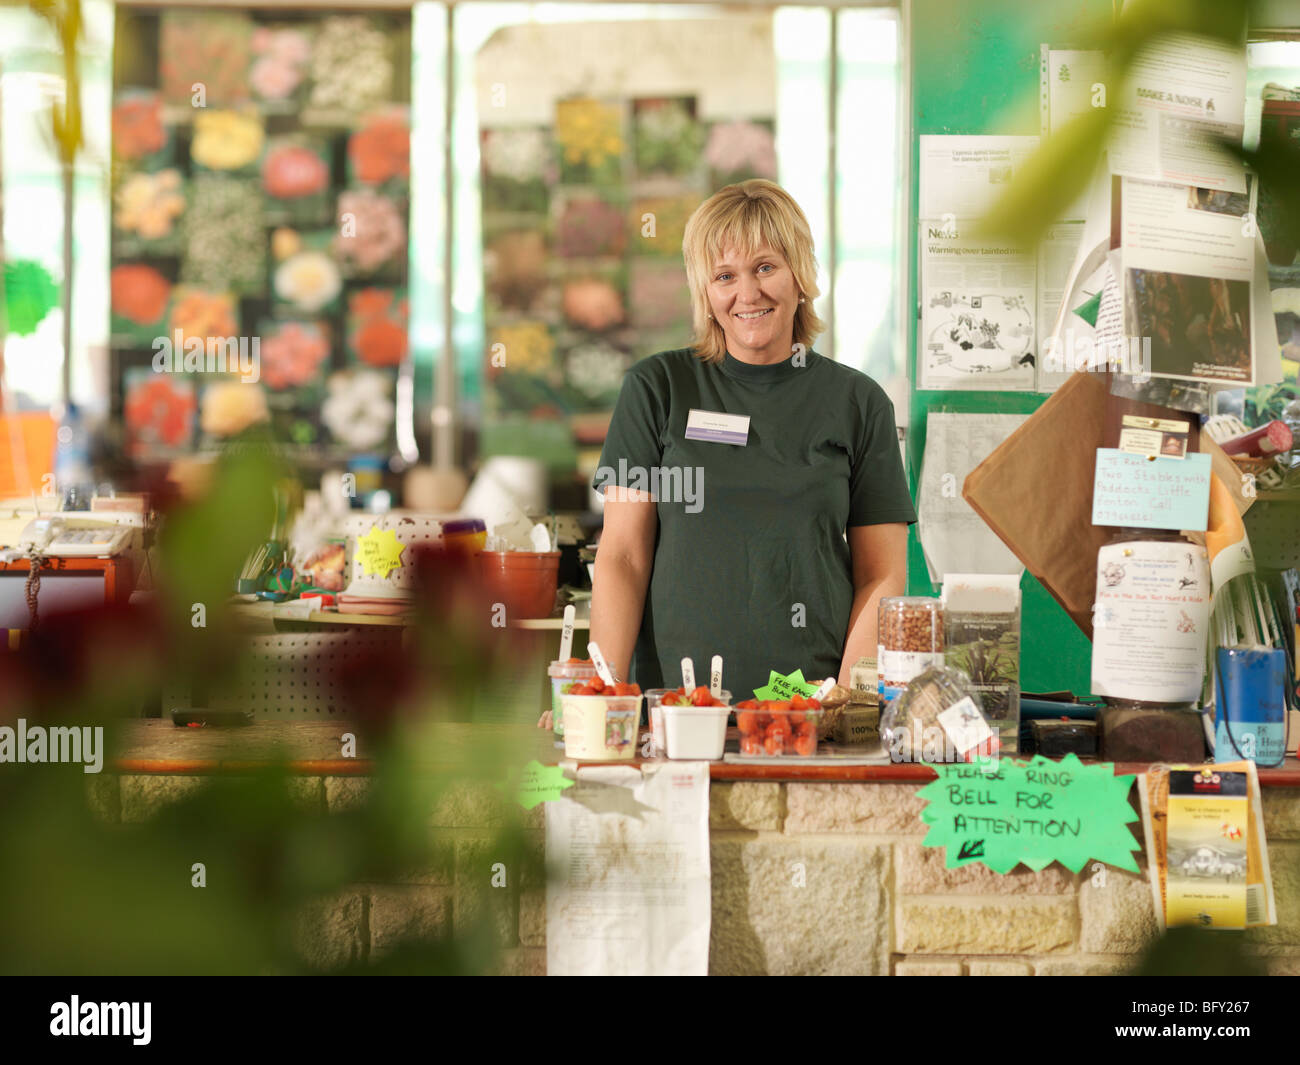 Female Garden Center Worker Behind Till - Stock Image